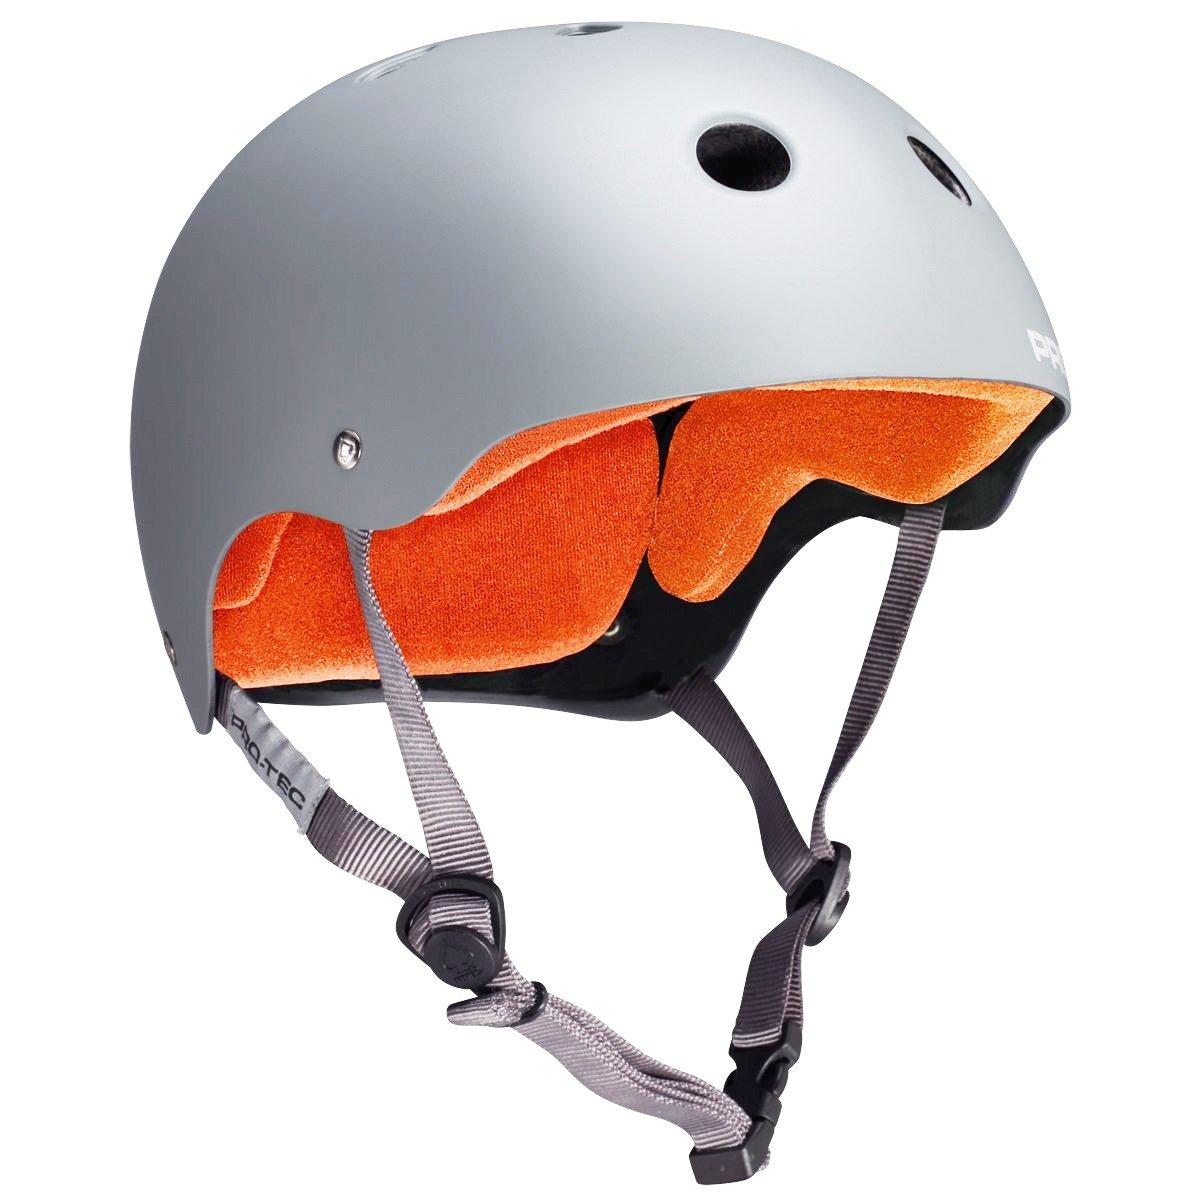 Image of PROTEC CLASSIC SKATE HELMET - GREY/ORANGE